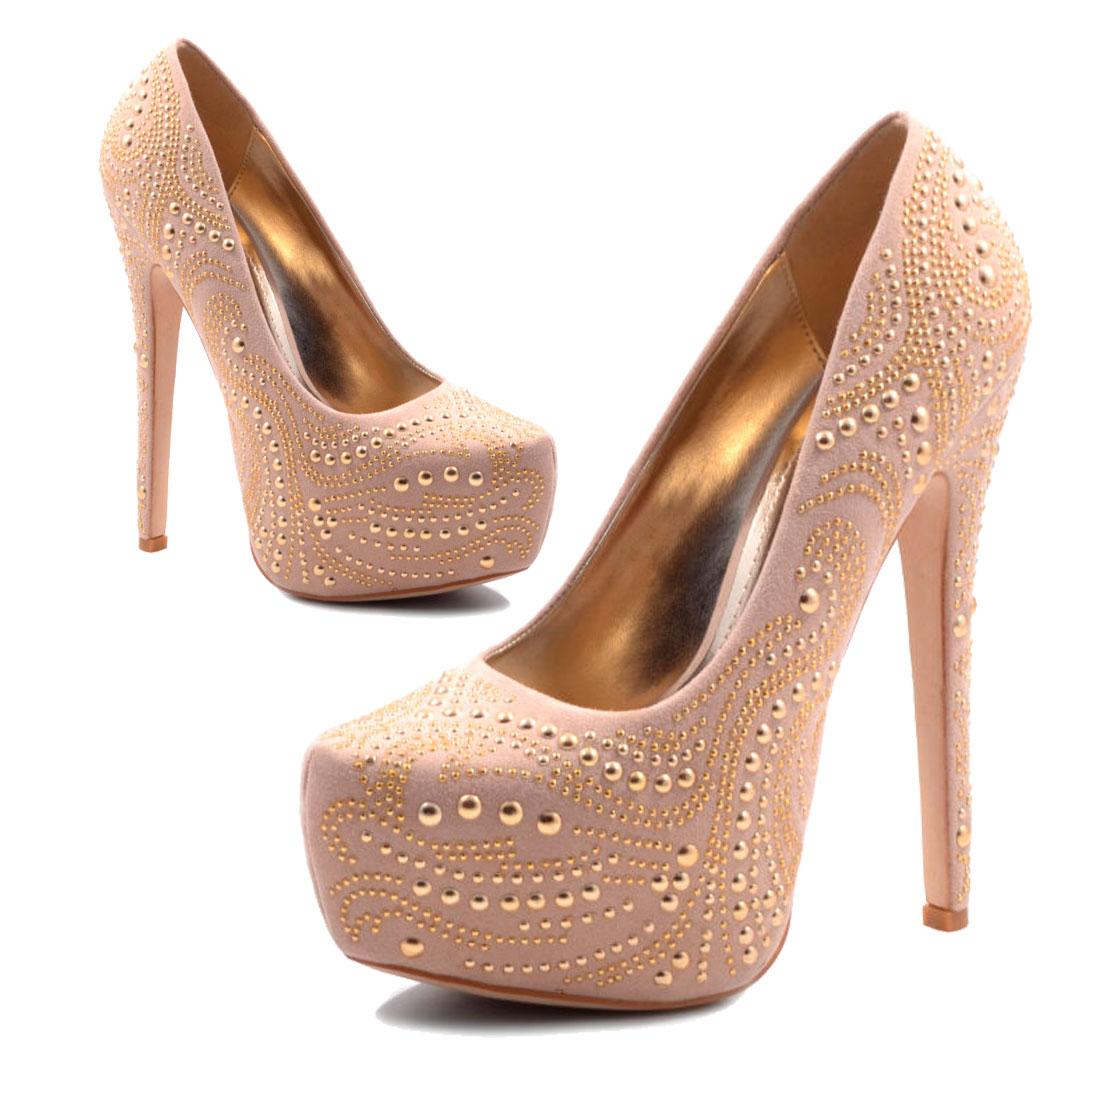 neu damen high heels party plateau pumps schuhe gr 35 36 37 38 39 40 41 ebay. Black Bedroom Furniture Sets. Home Design Ideas